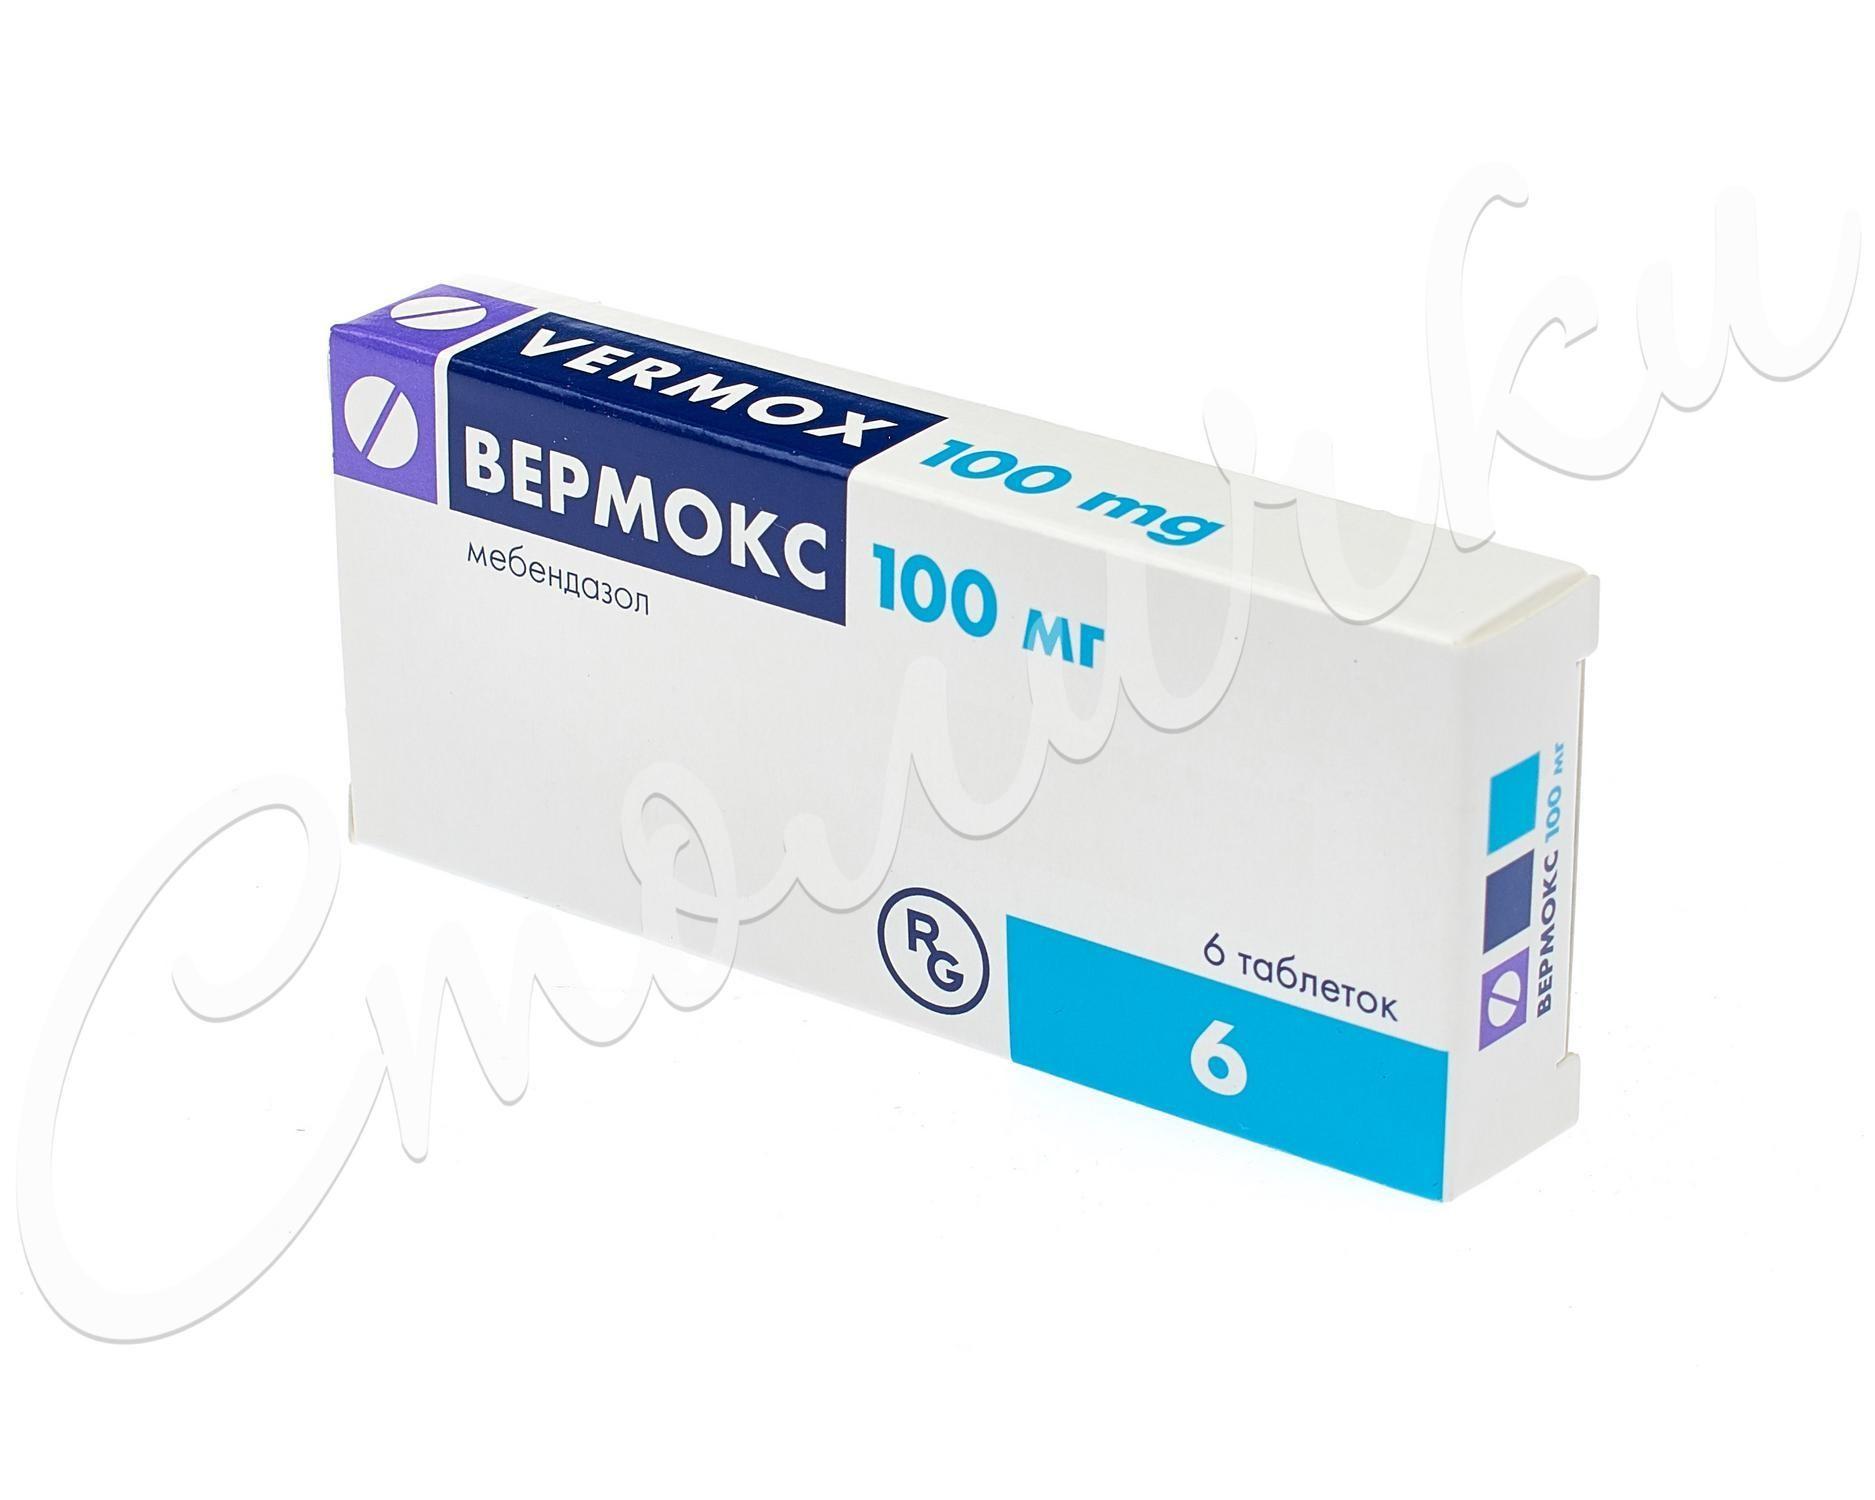 Вермокс таблетки цена украина, Vermox таблетки отзывы